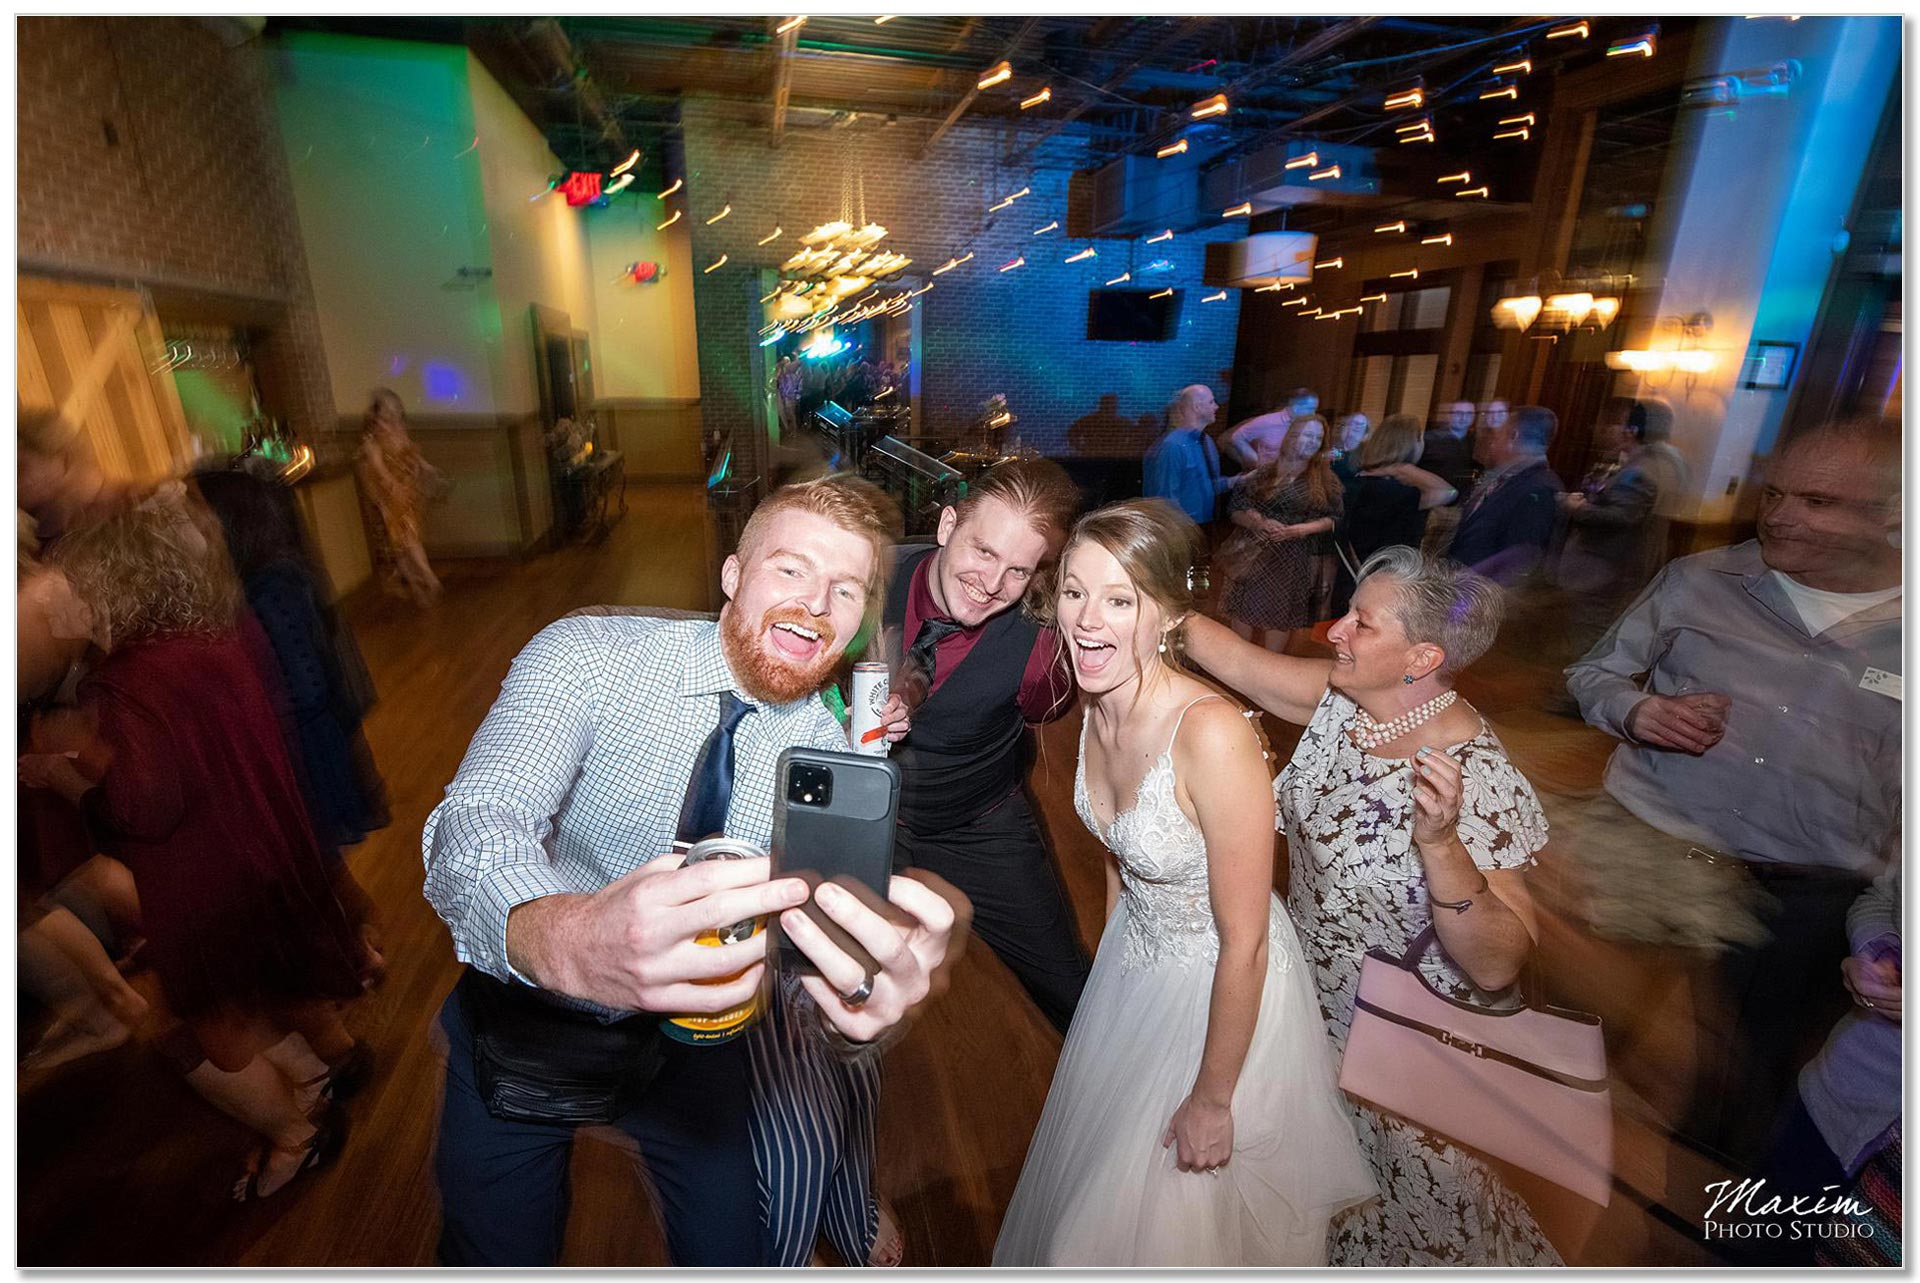 Backstage Event Center Wedding Reception Guests dancing